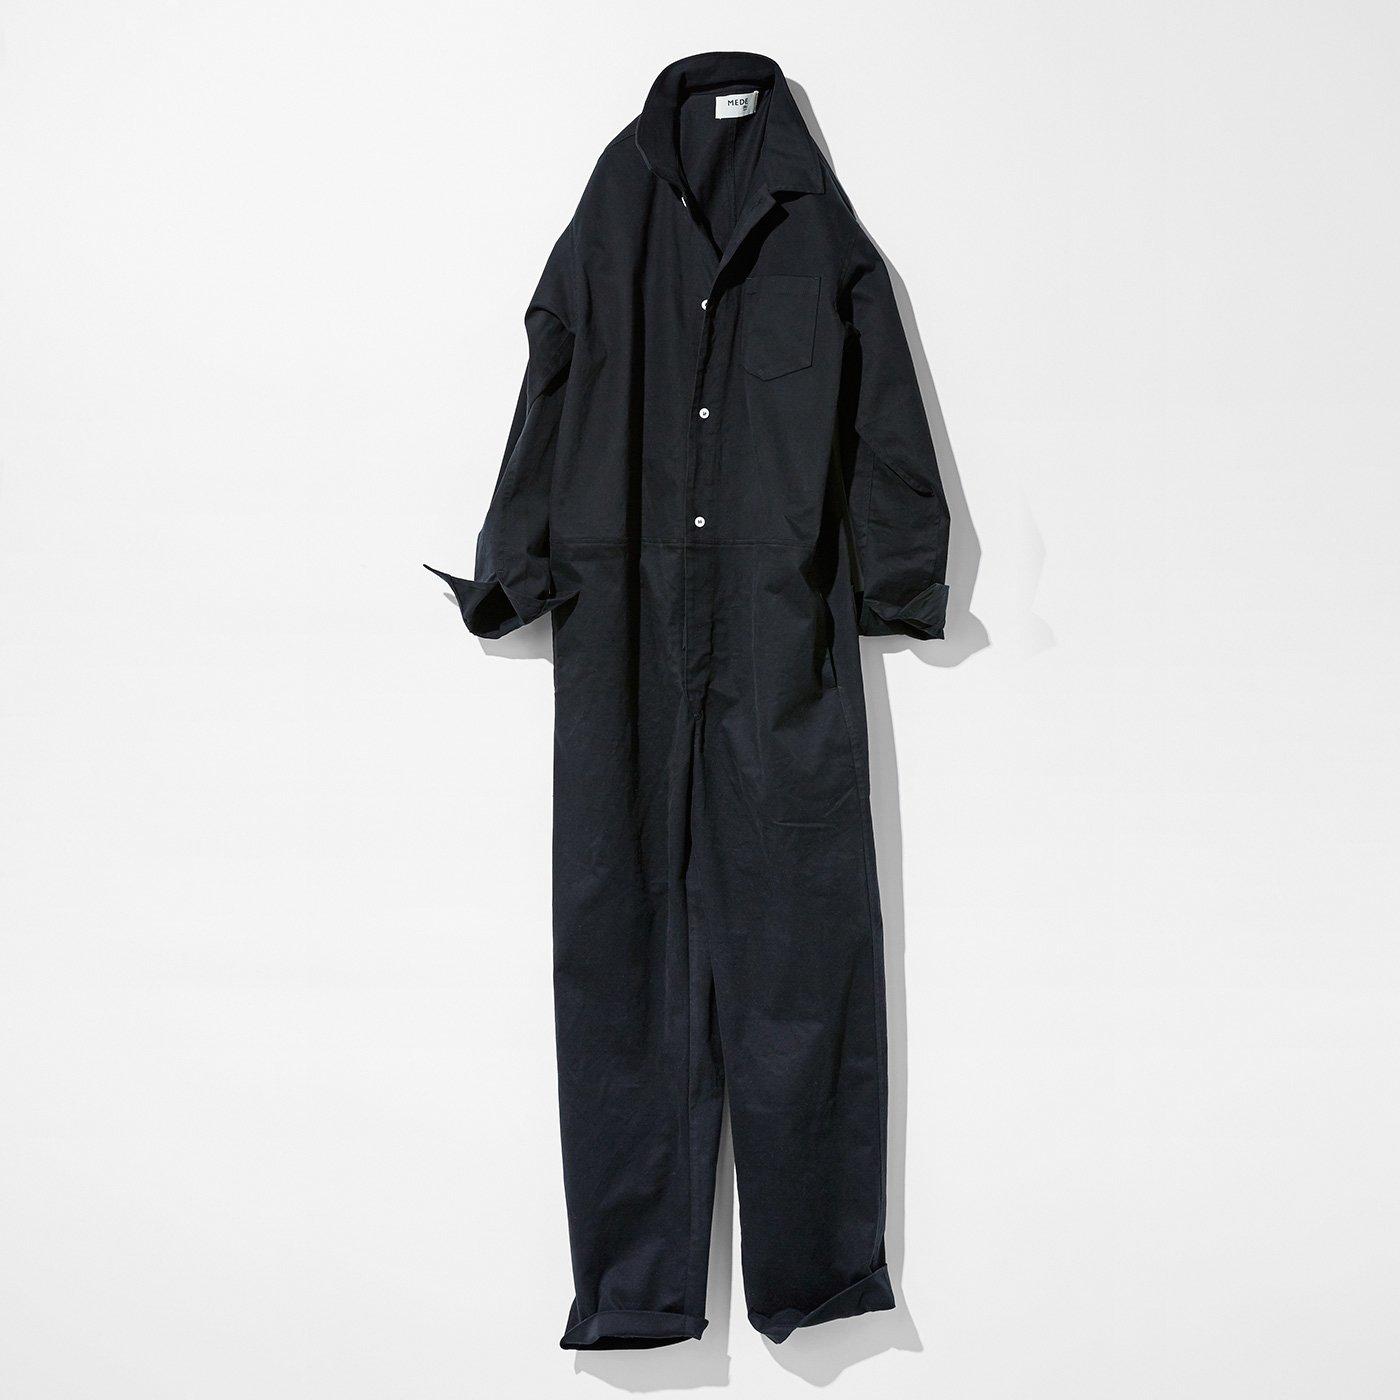 MEDE19F ボイラースーツ〈ブラック〉